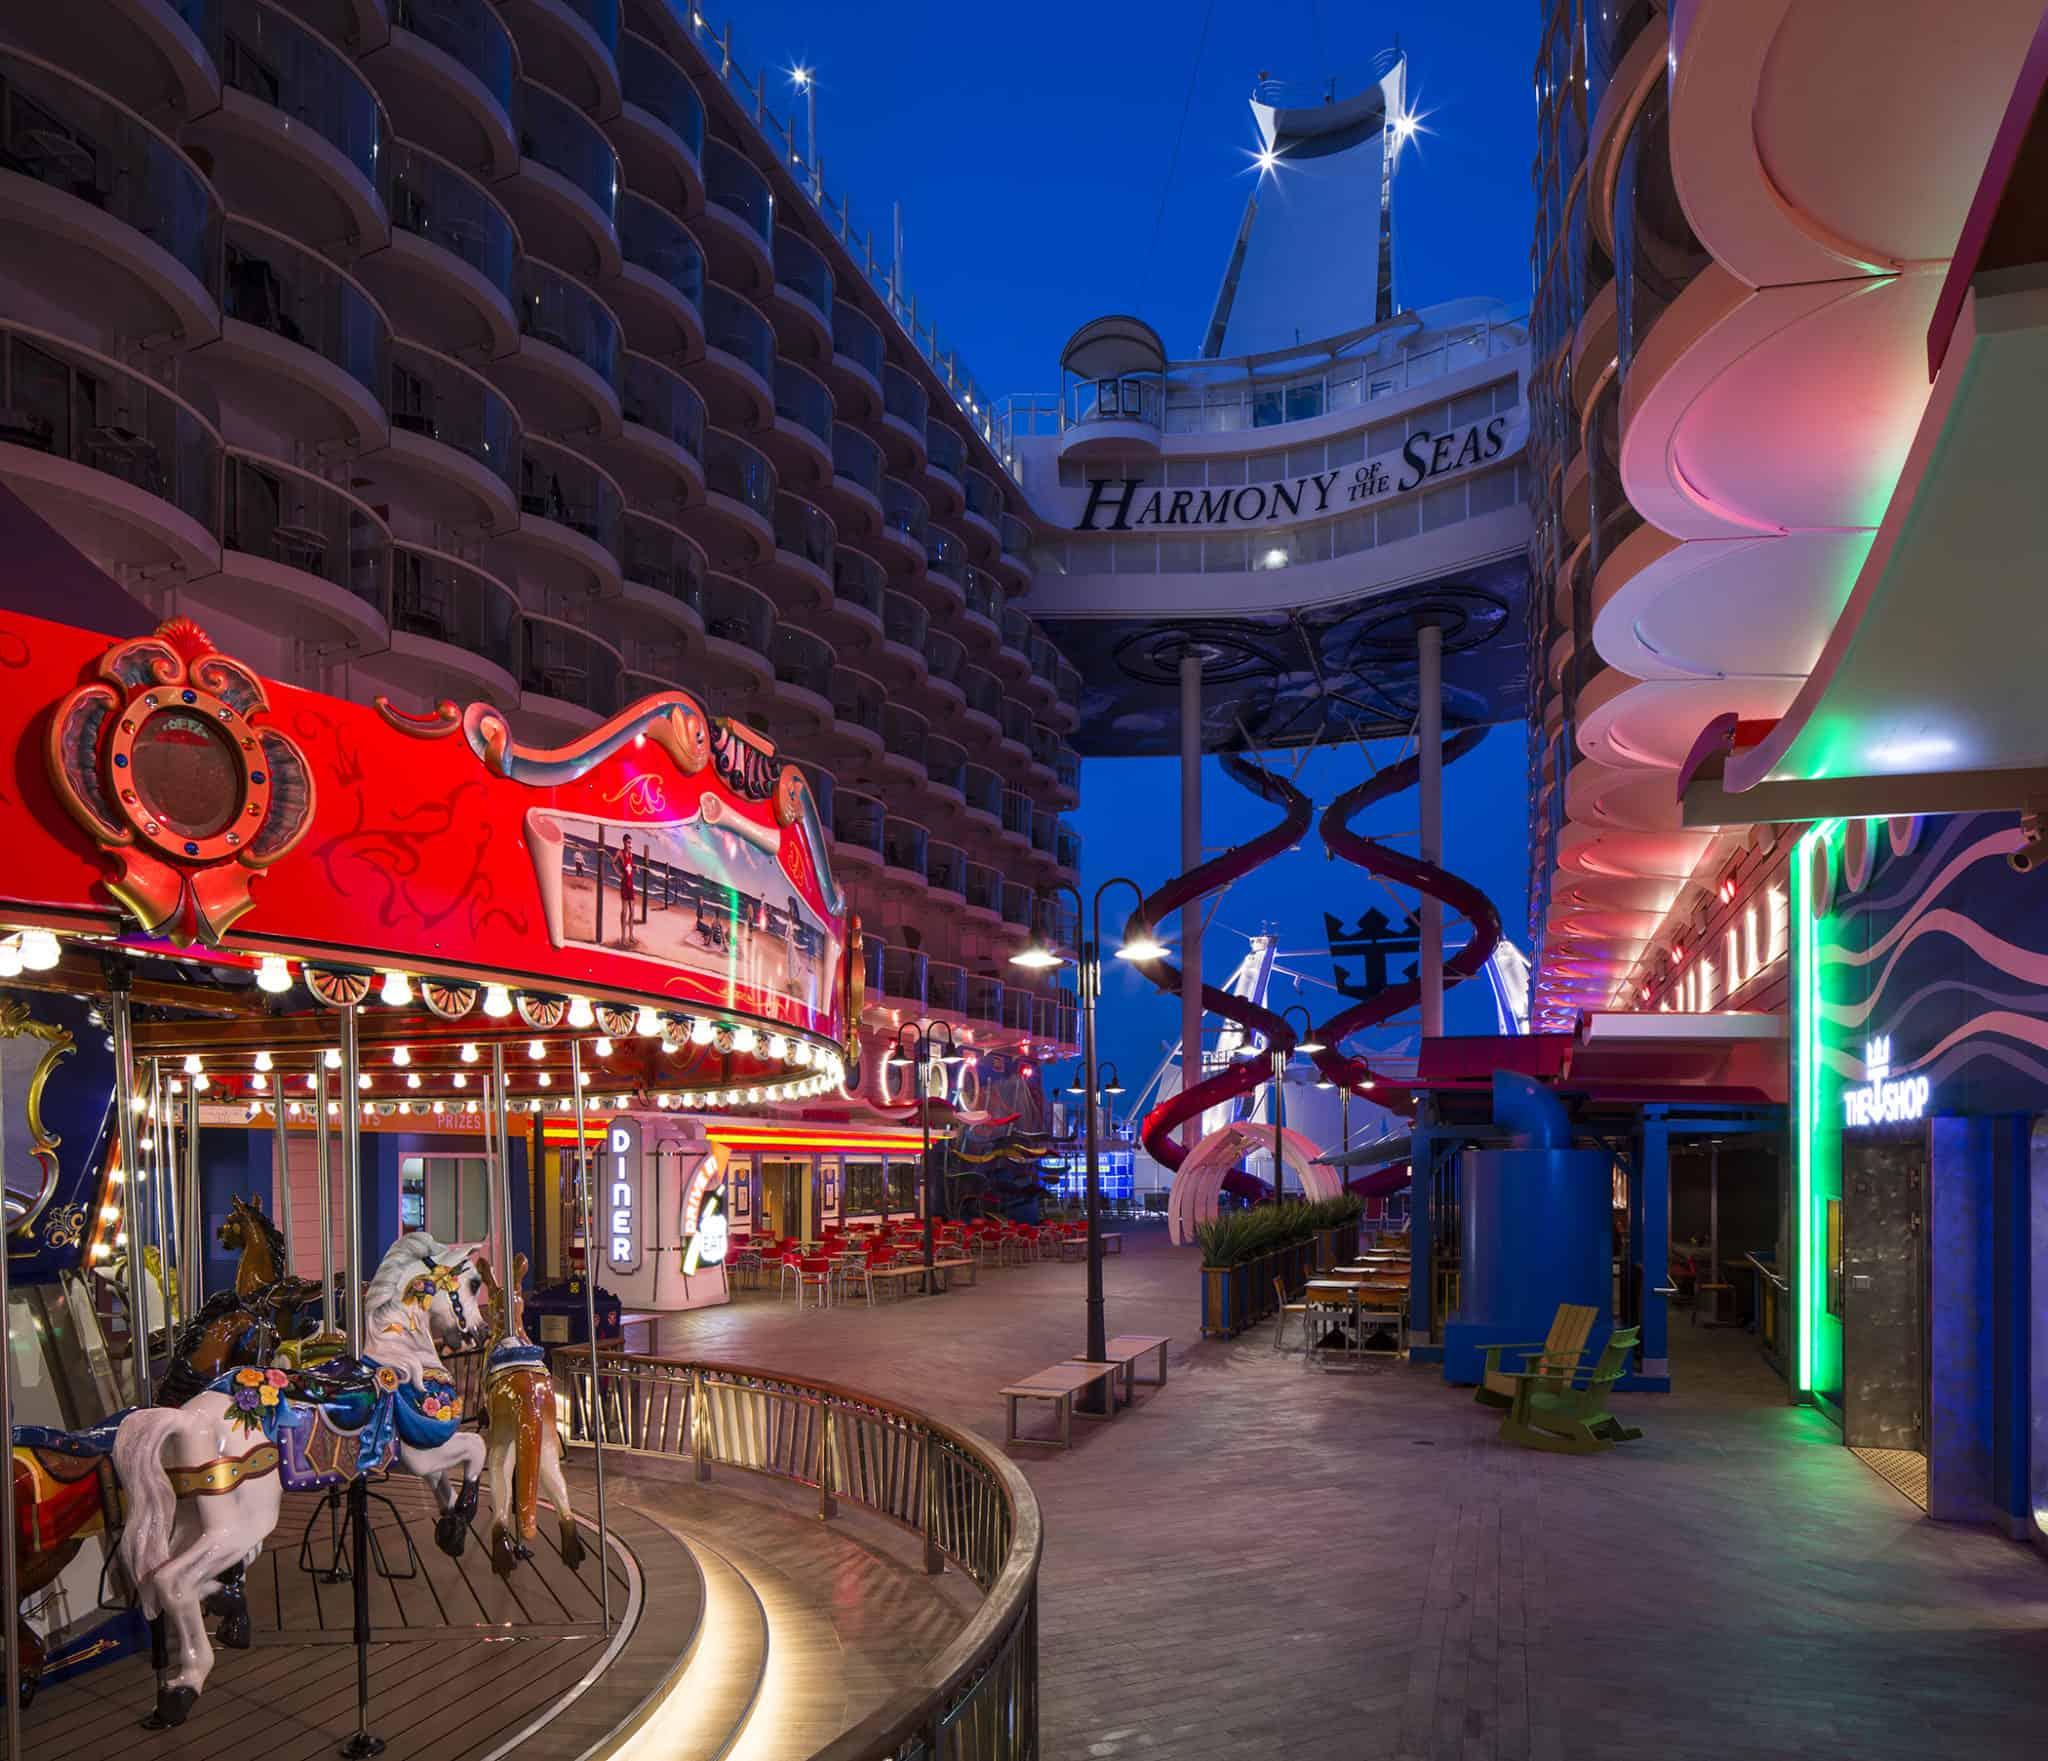 The Boardwalk - Deck 6 Aft Harmony of the Seas - Royal Caribbean Inetrnational